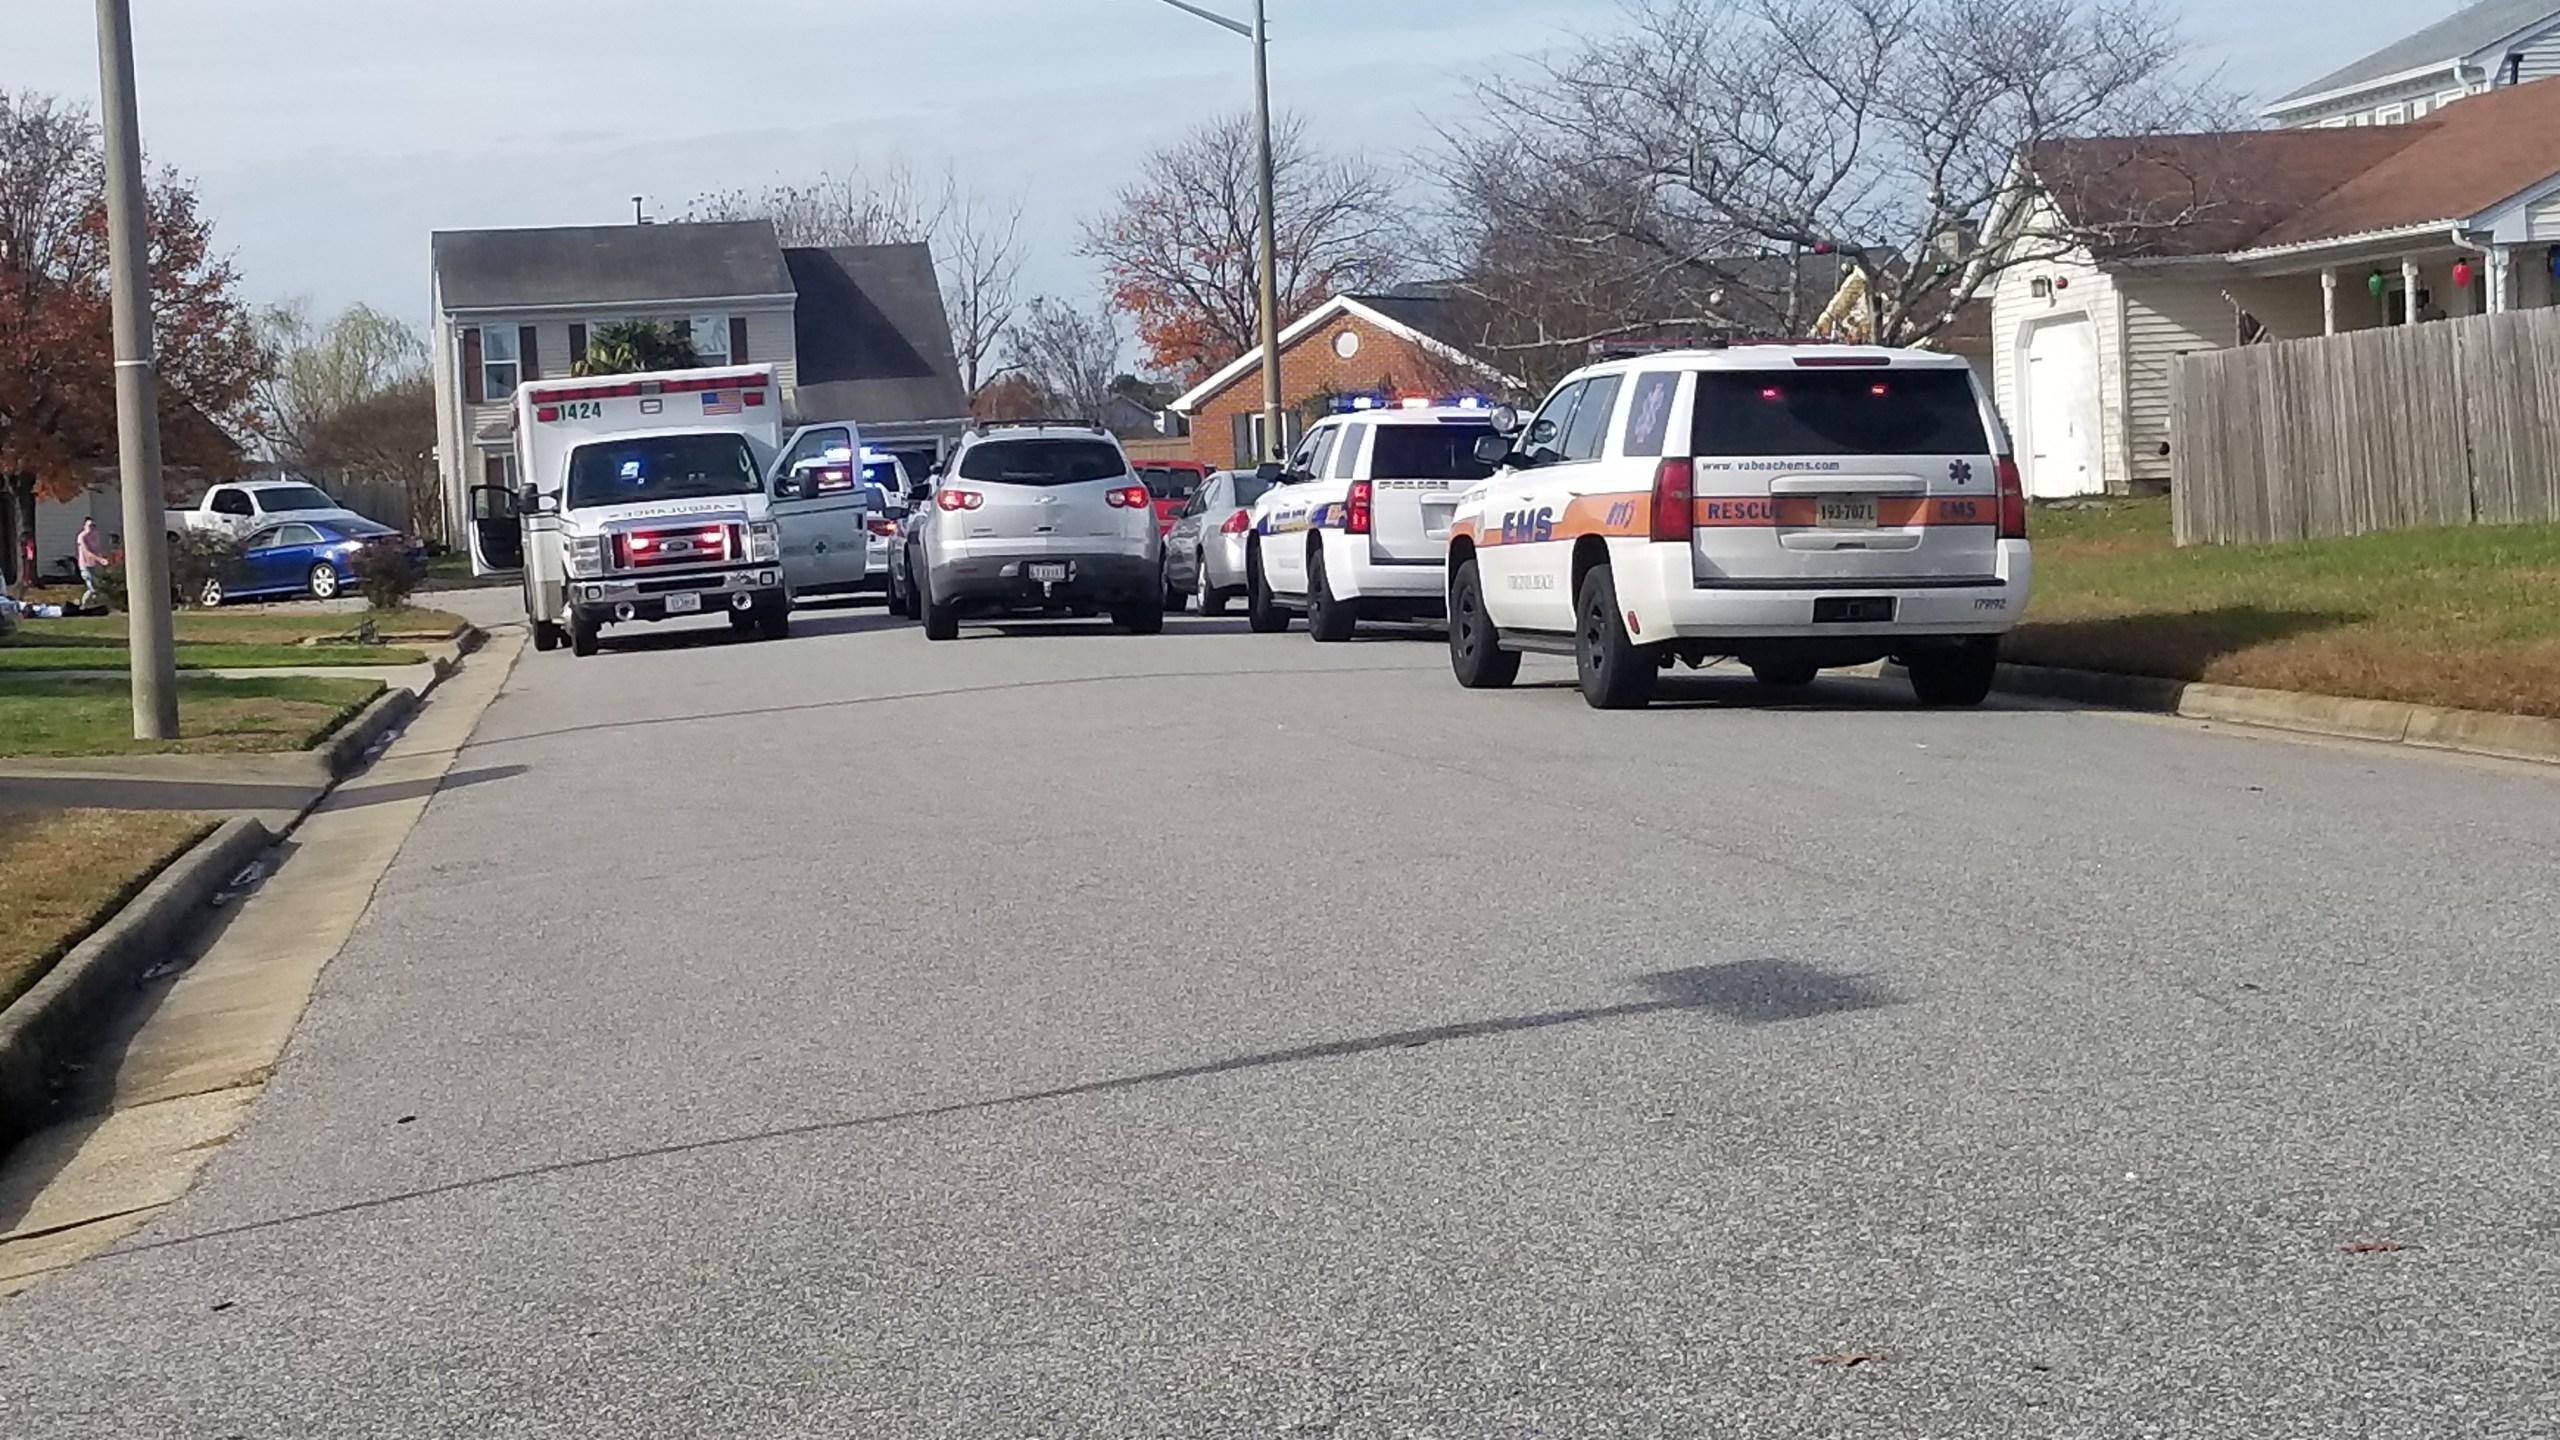 Virginia Beach Revelstone Court shooting